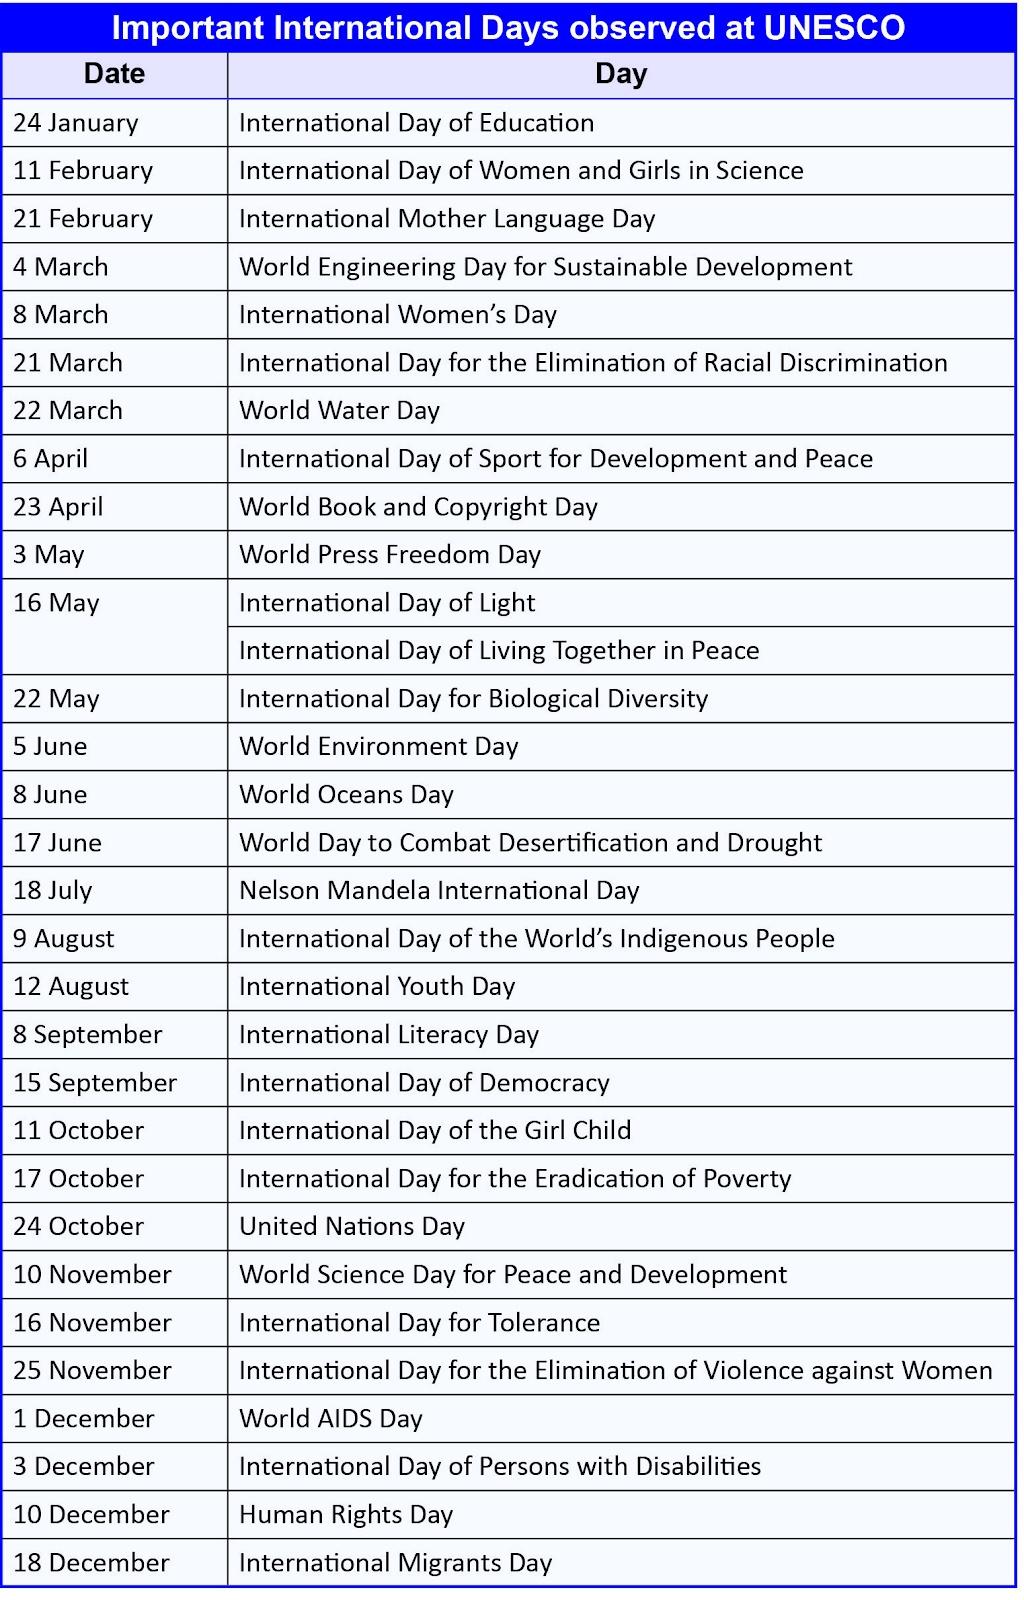 Important-internation-days